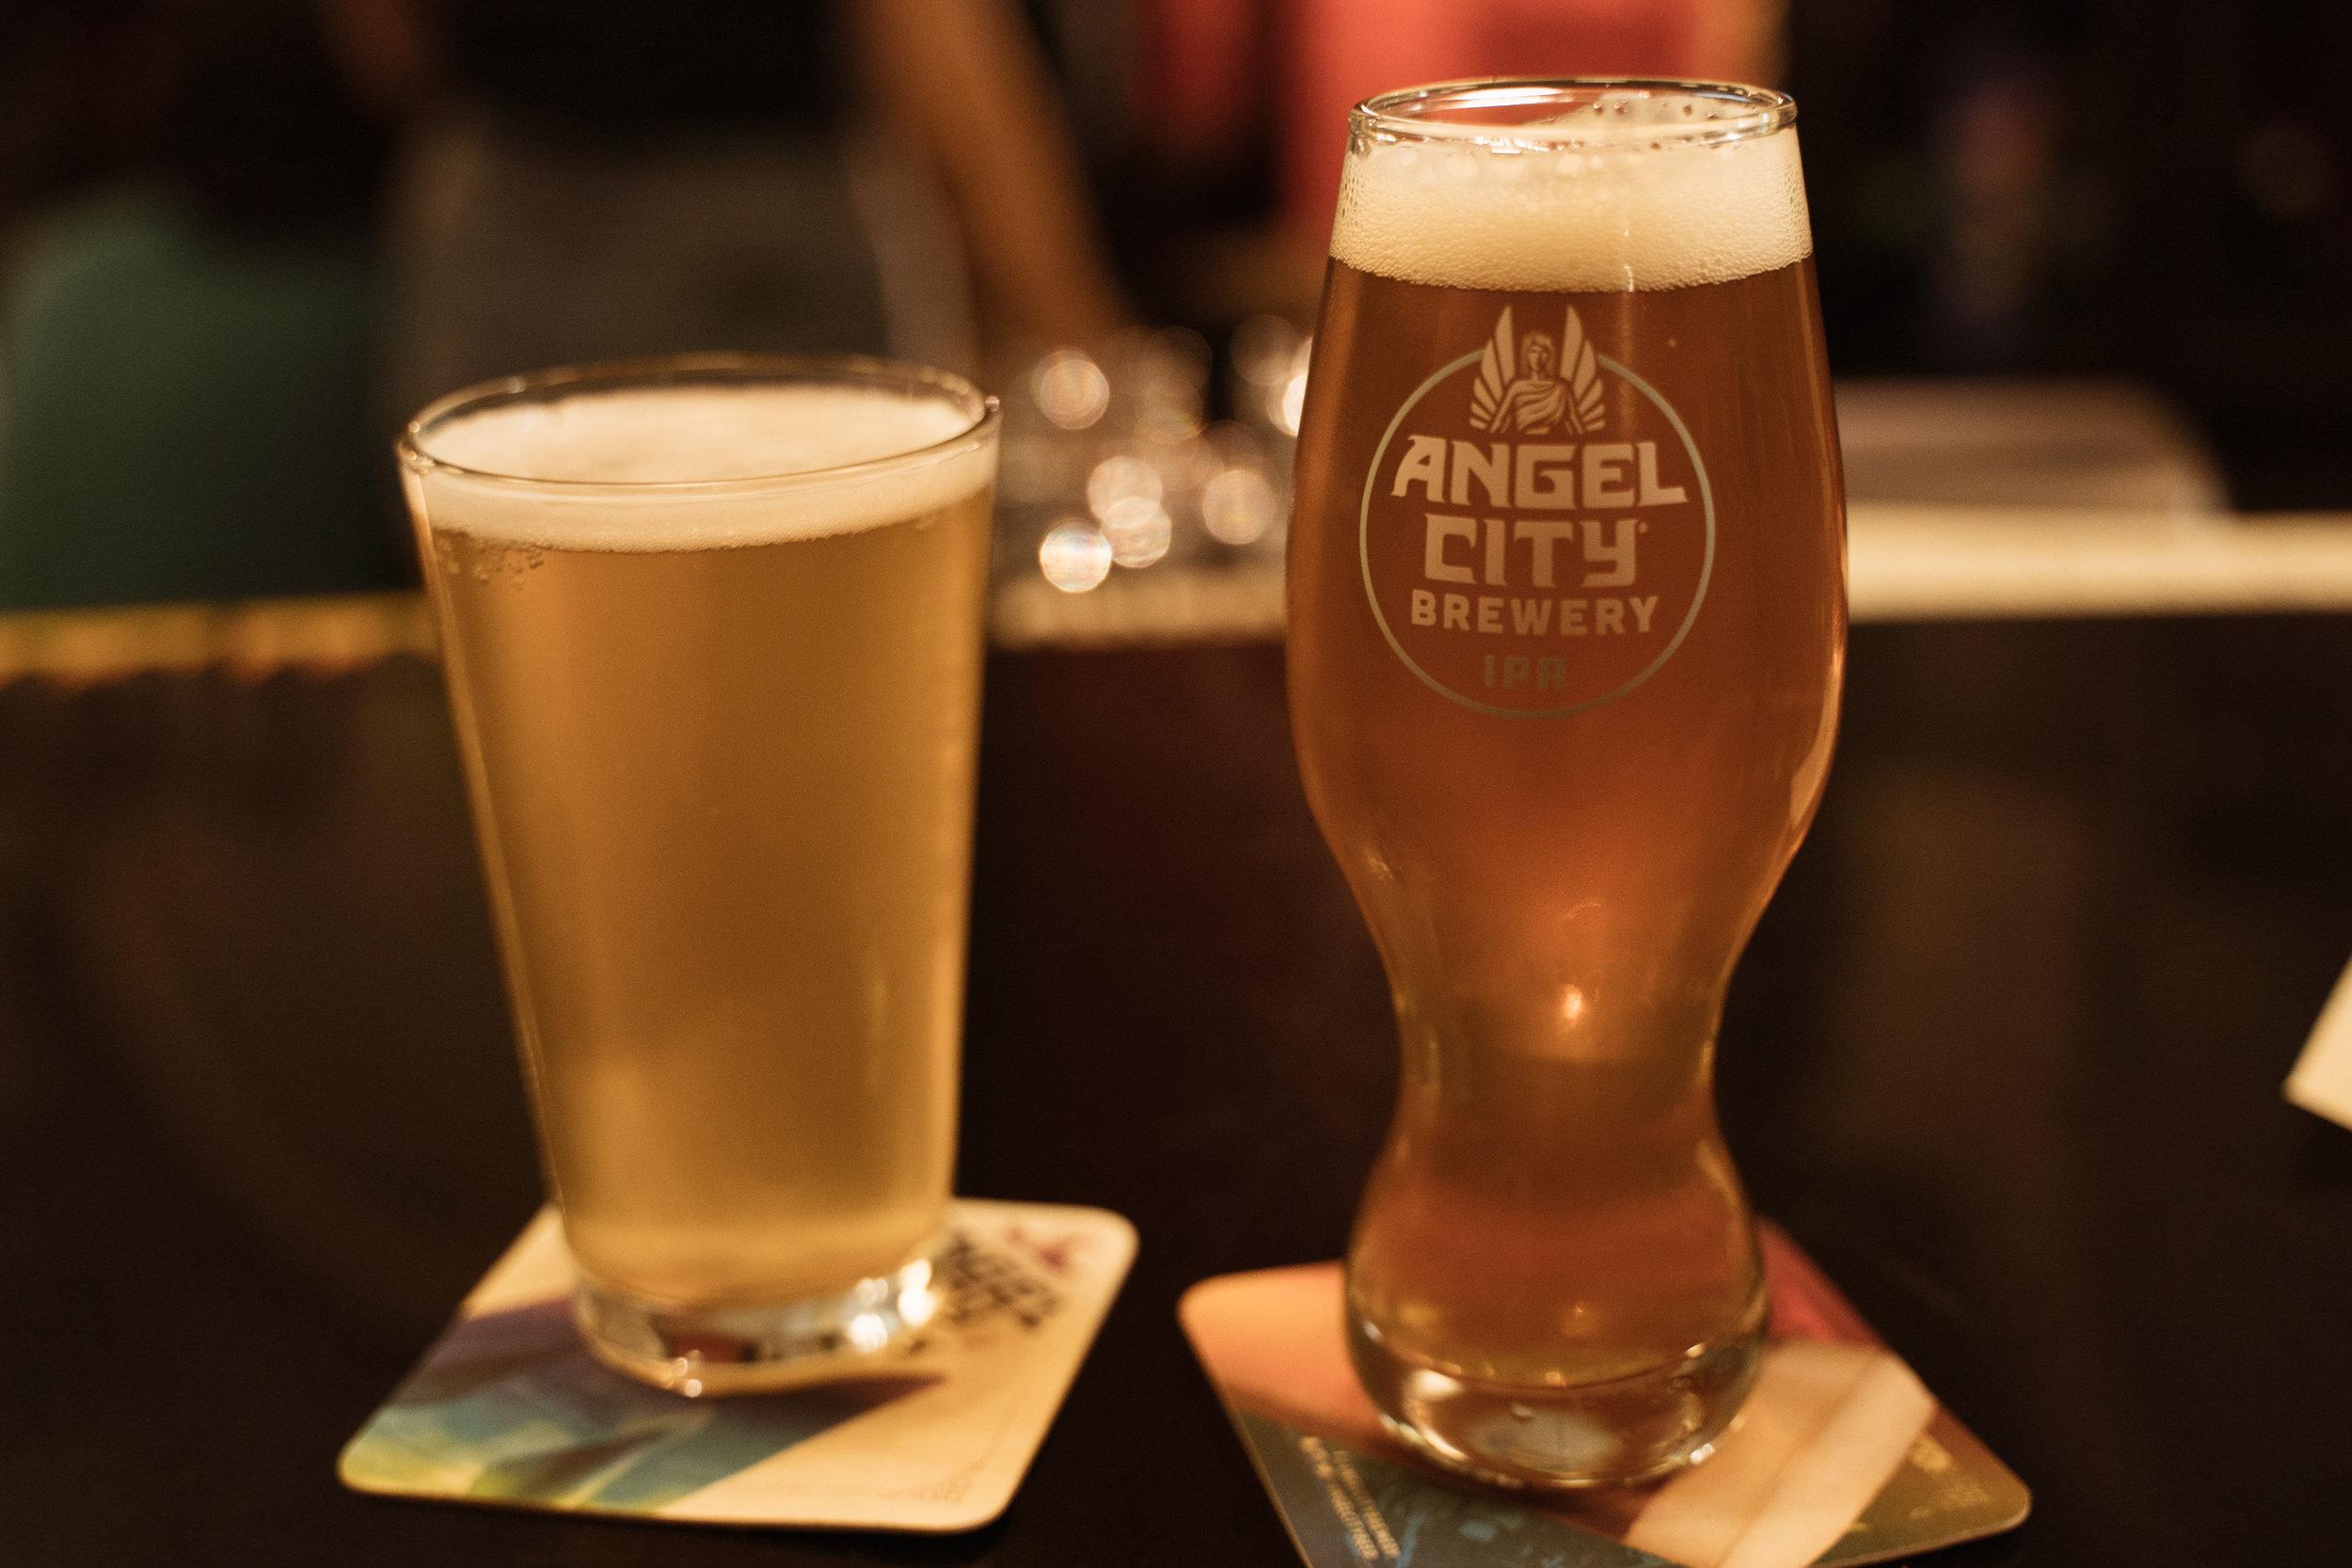 Beers at Angel City Brewery